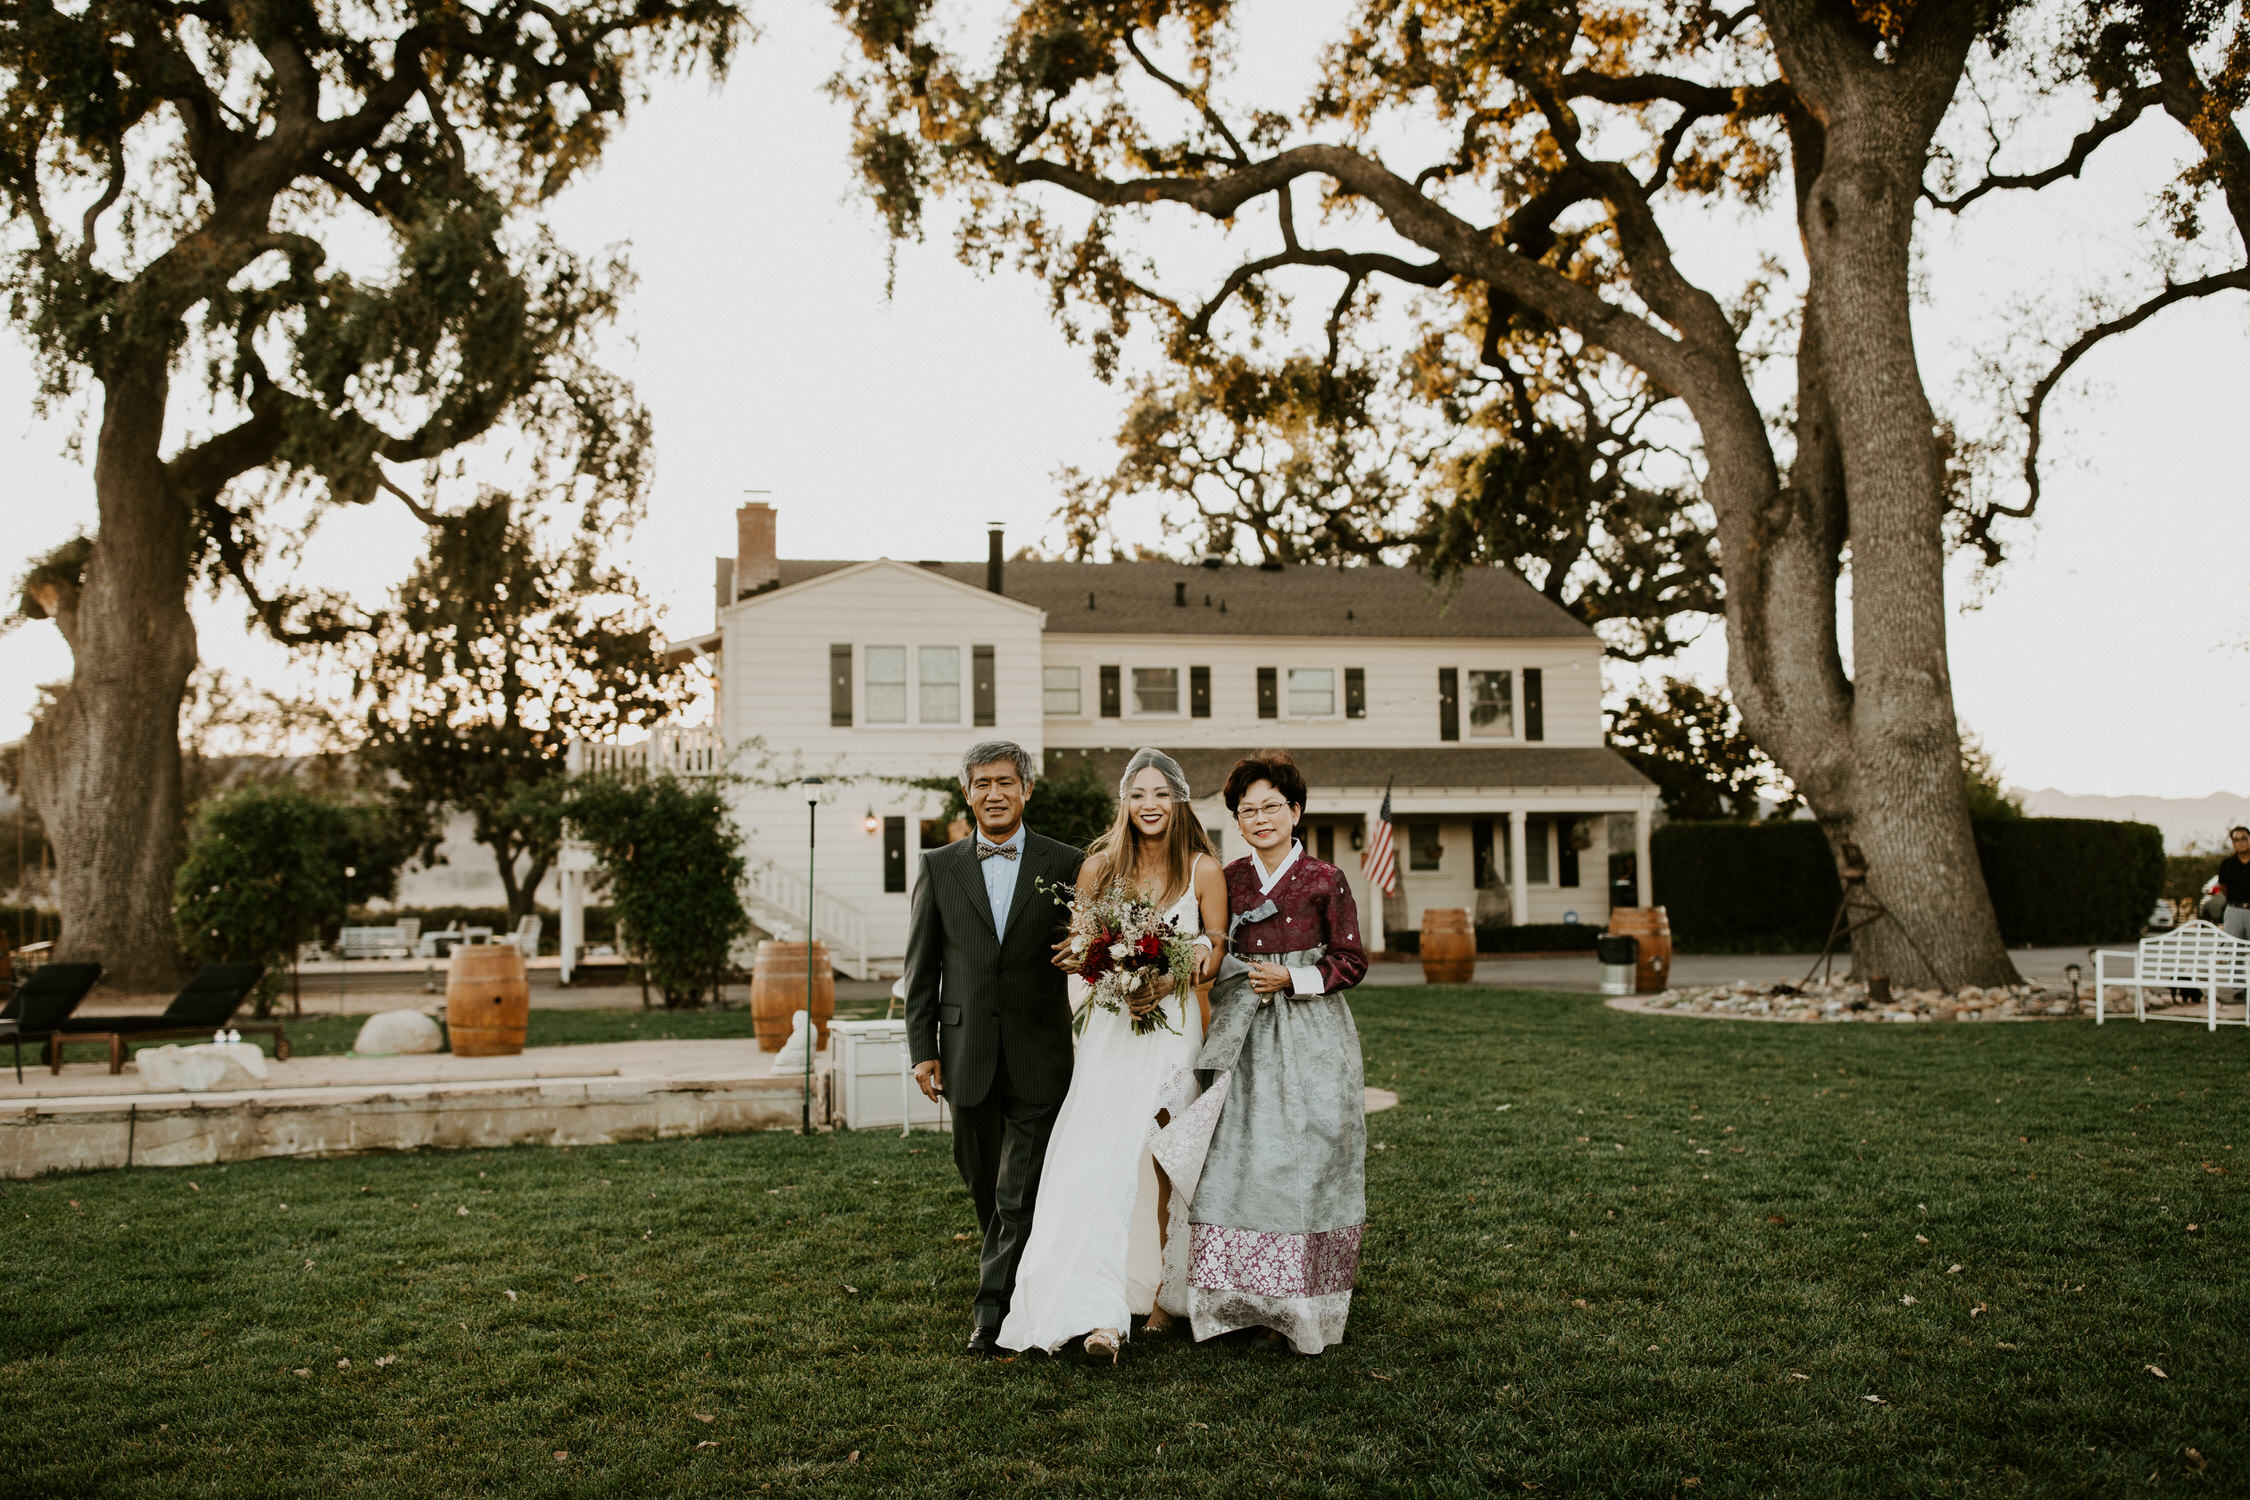 couple-intimate-wedding-northern-california-111.jpg